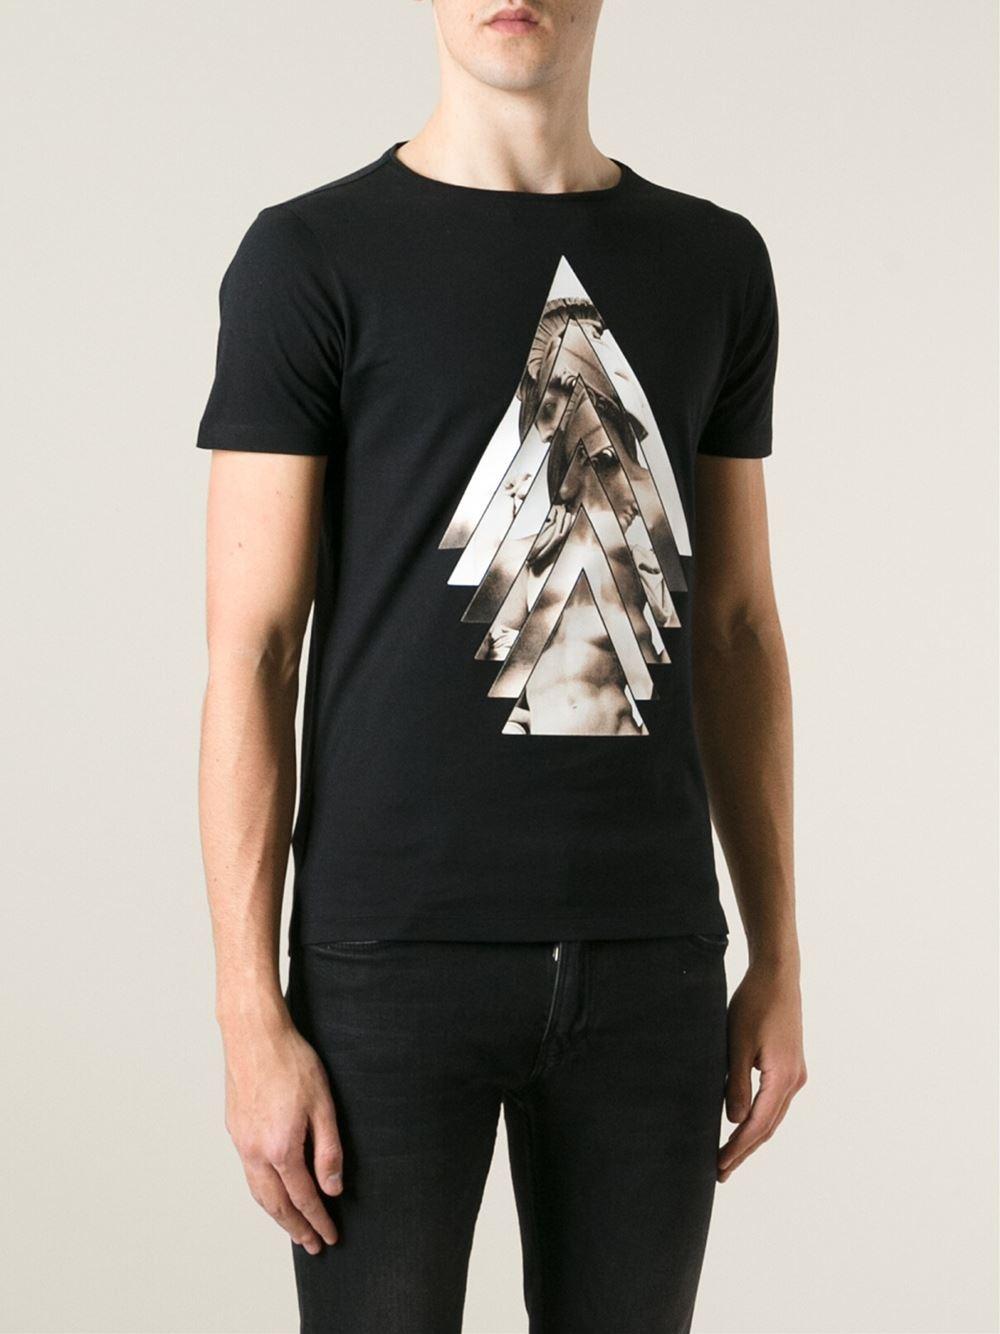 Lyst Emporio Armani 39 David 39 Print T Shirt In Black For Men